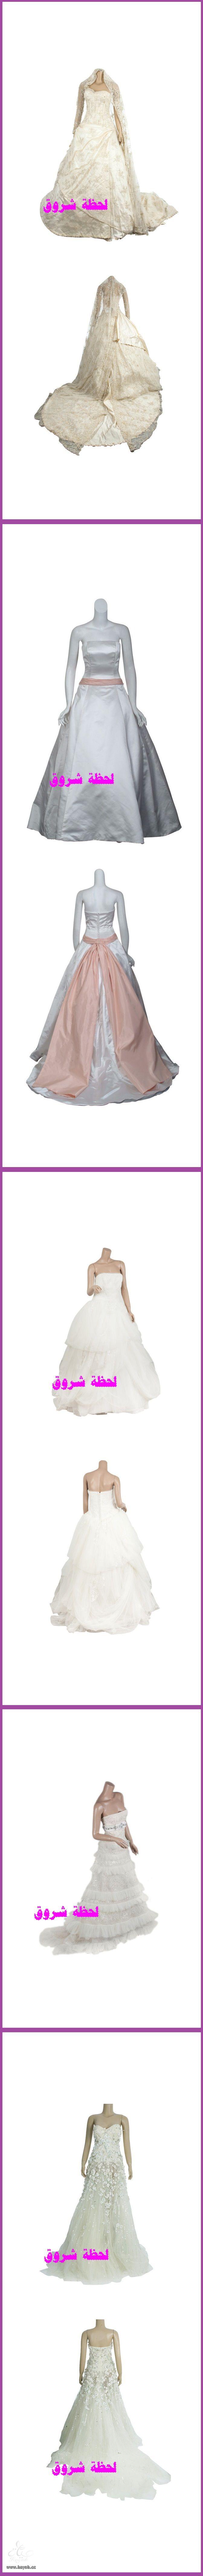 صور فساتين زفاف hayahcc_1451762234_708.jpg